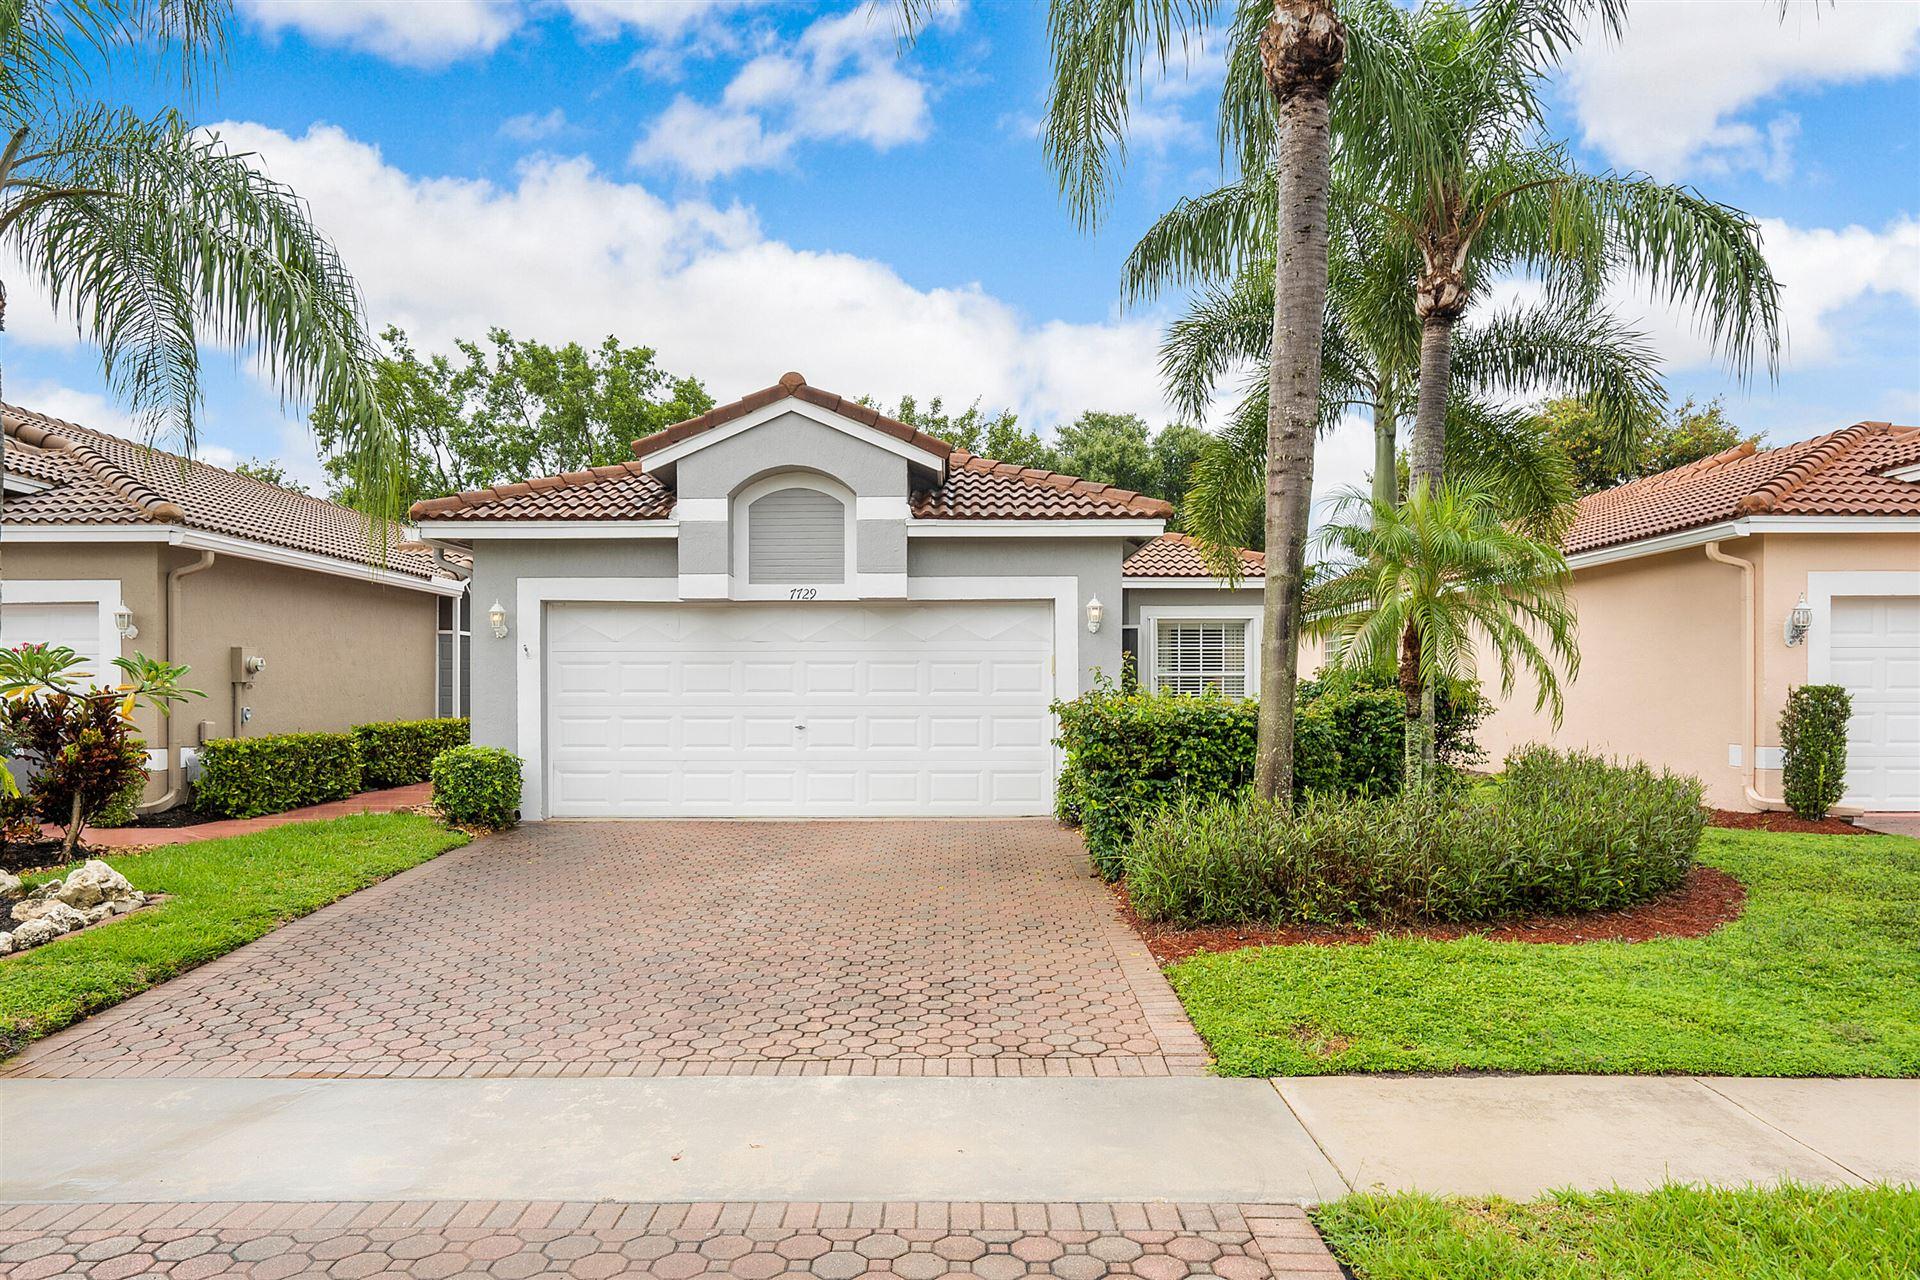 7729 Cherry Blossom Street, Boynton Beach, FL 33437 - MLS#: RX-10747347